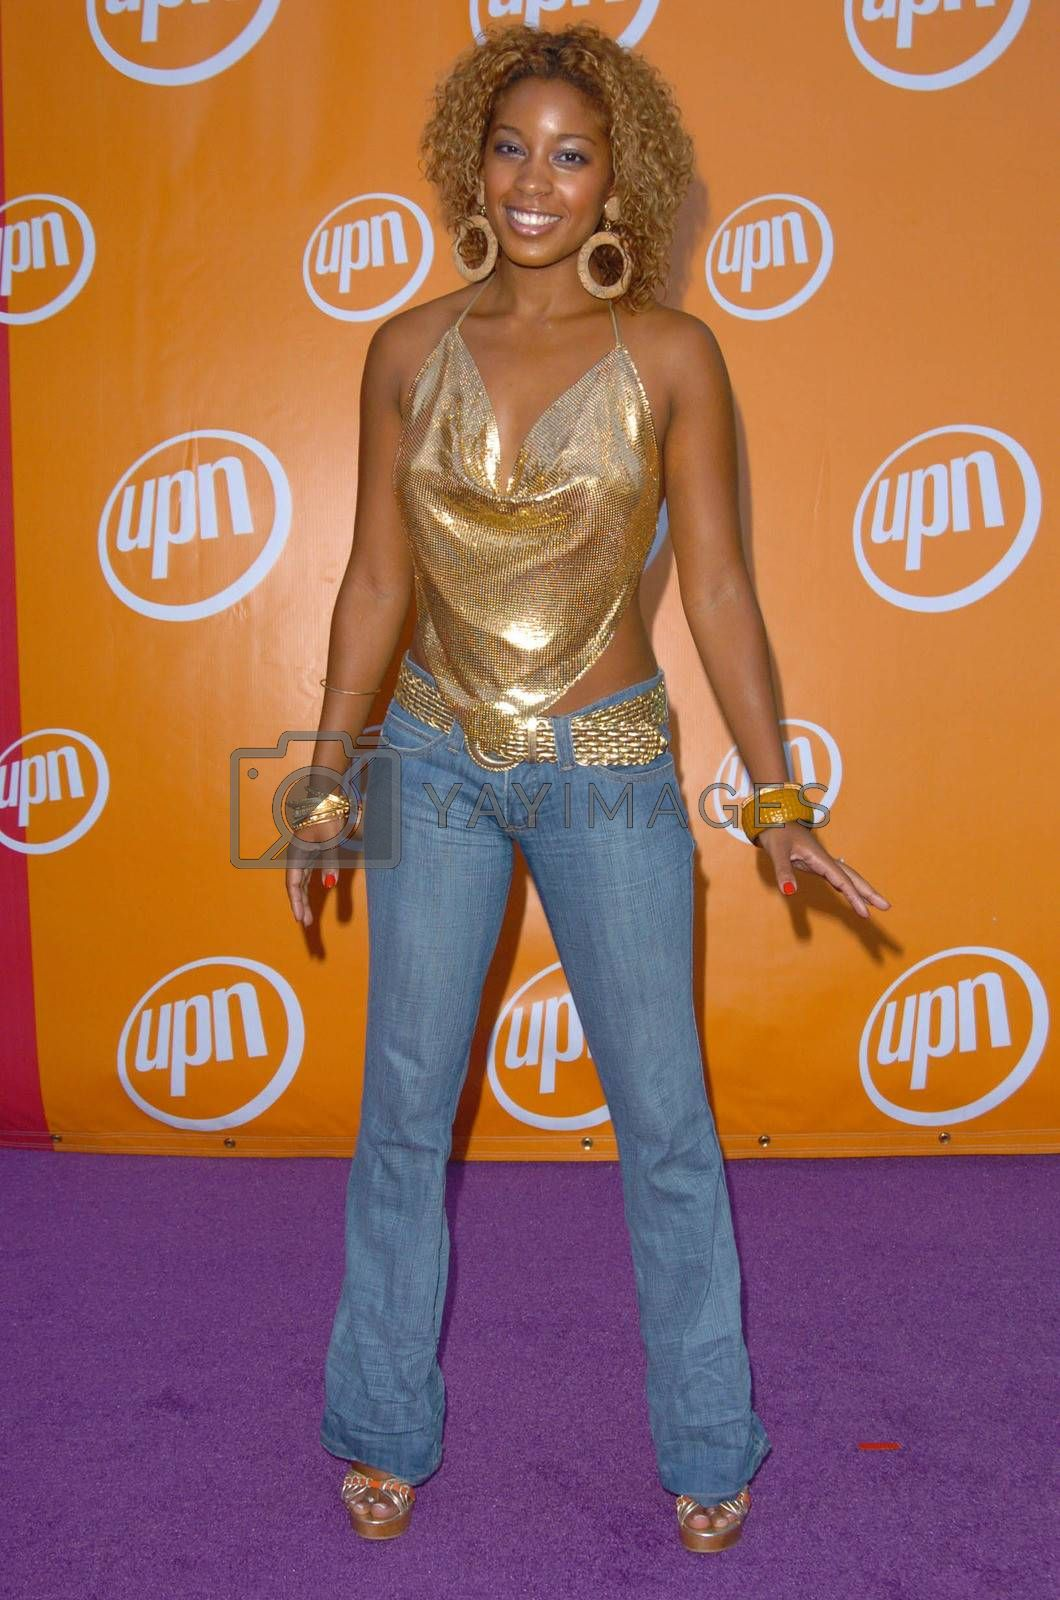 Reagan Gomez Preston At the UPN Summer TCA Party, Paramount Studios, Hollywood, CA 07-21-05